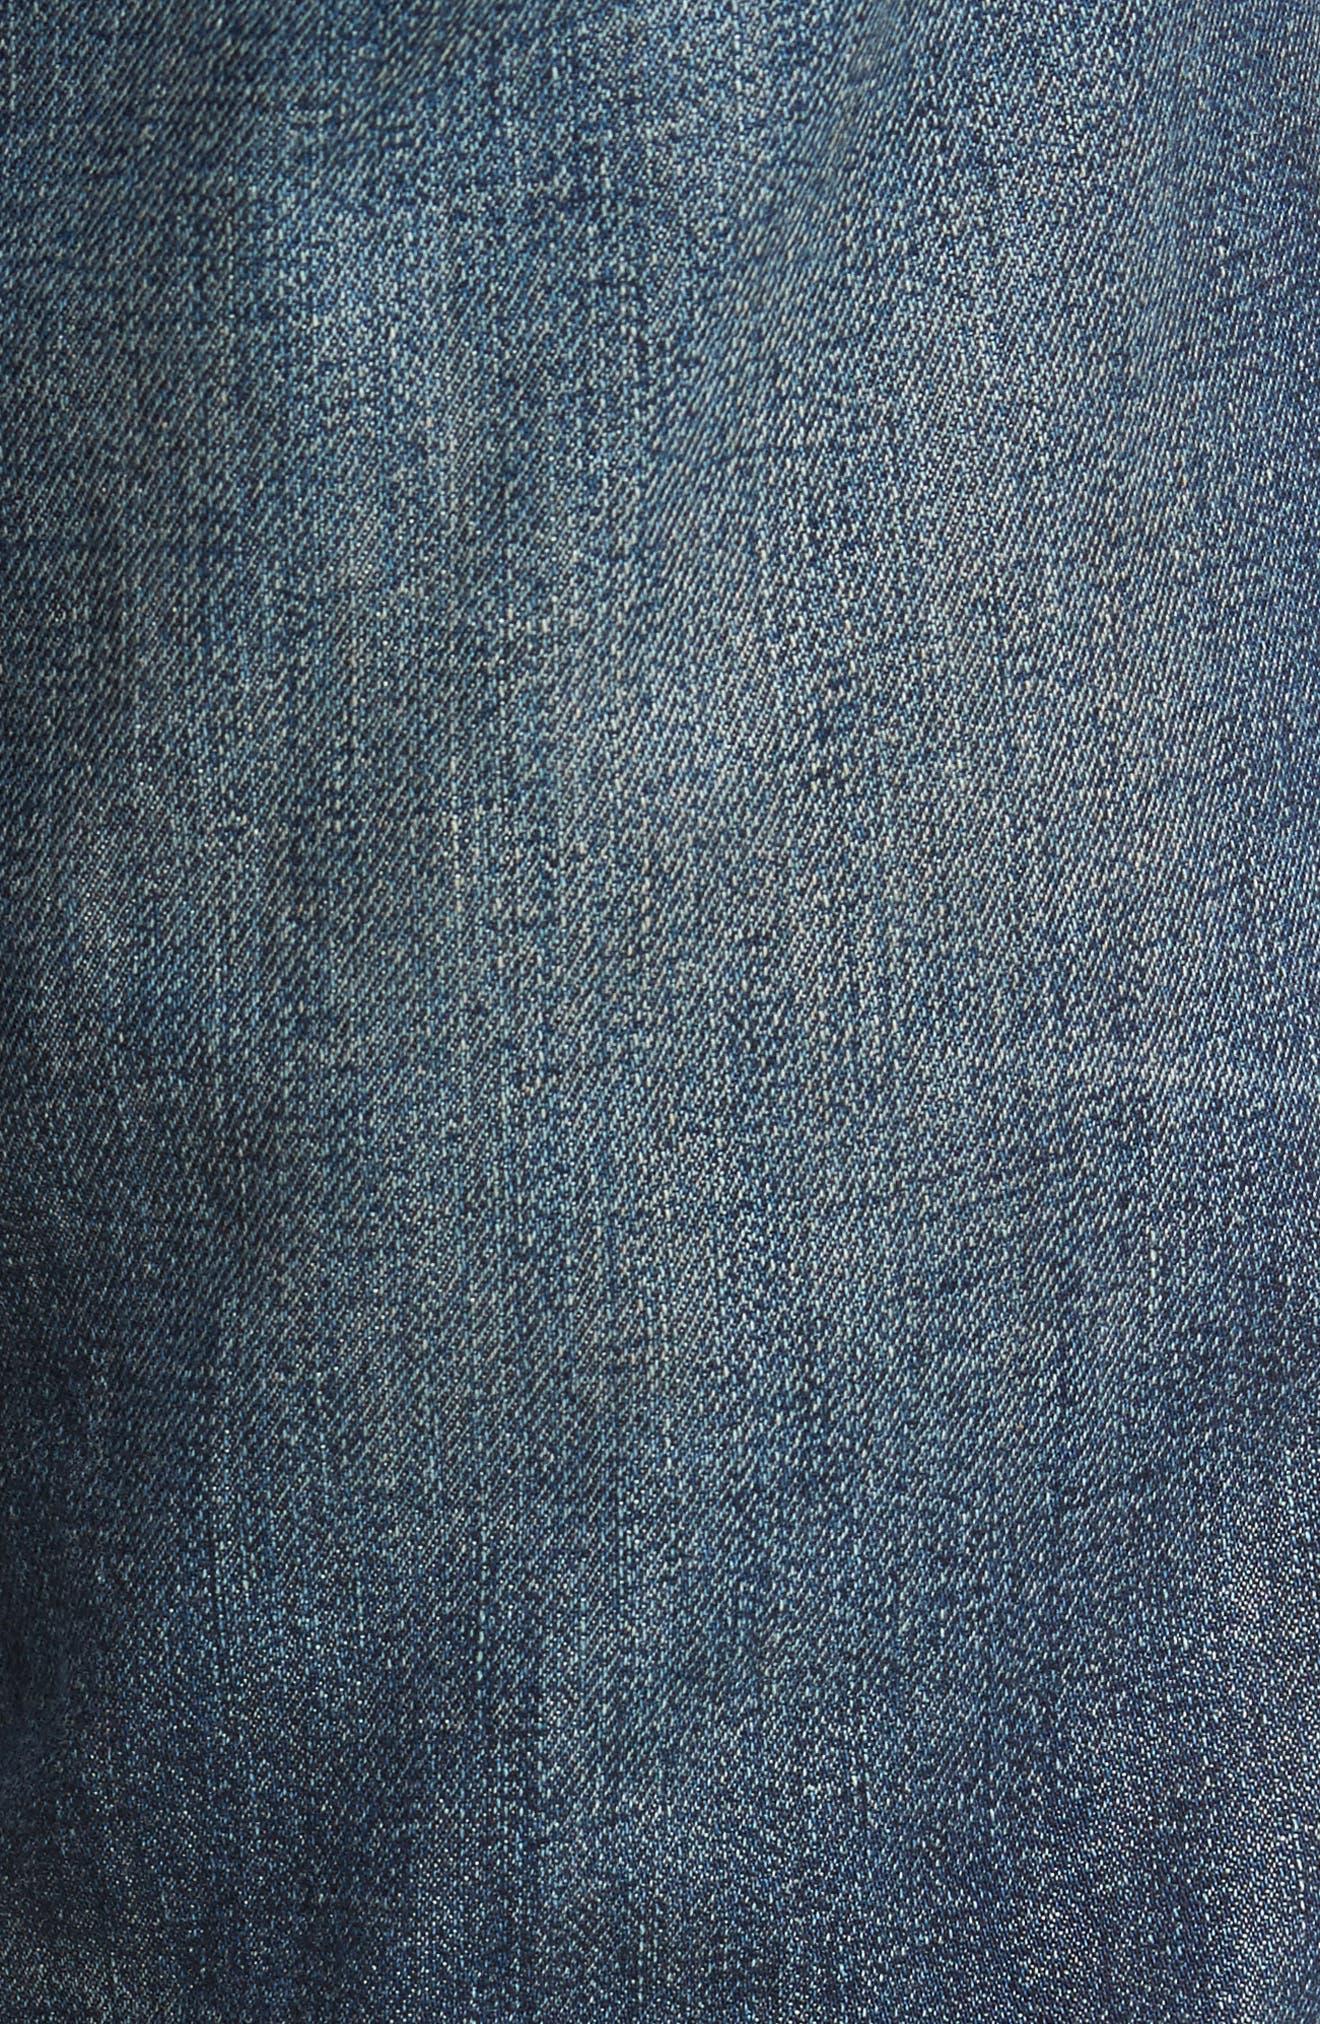 Geno Straight Leg Jeans,                             Alternate thumbnail 5, color,                             Street Dweller